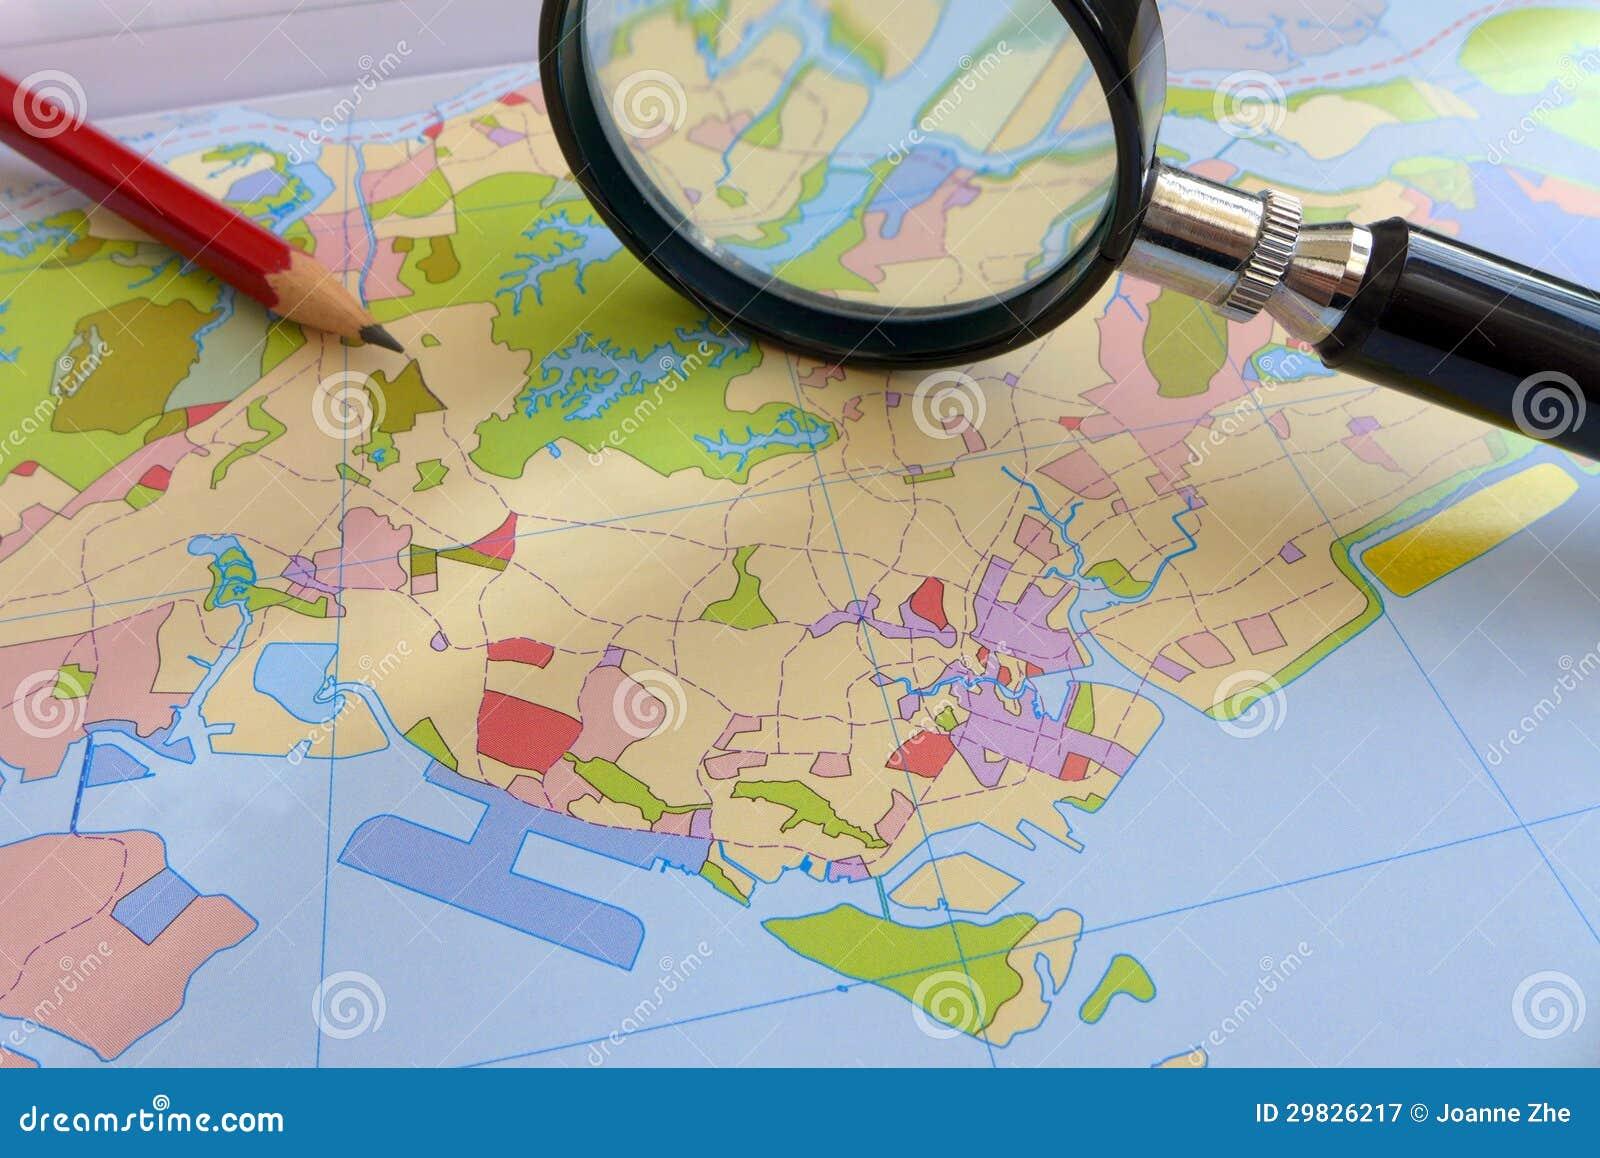 Land usage - Coastal city planning concept